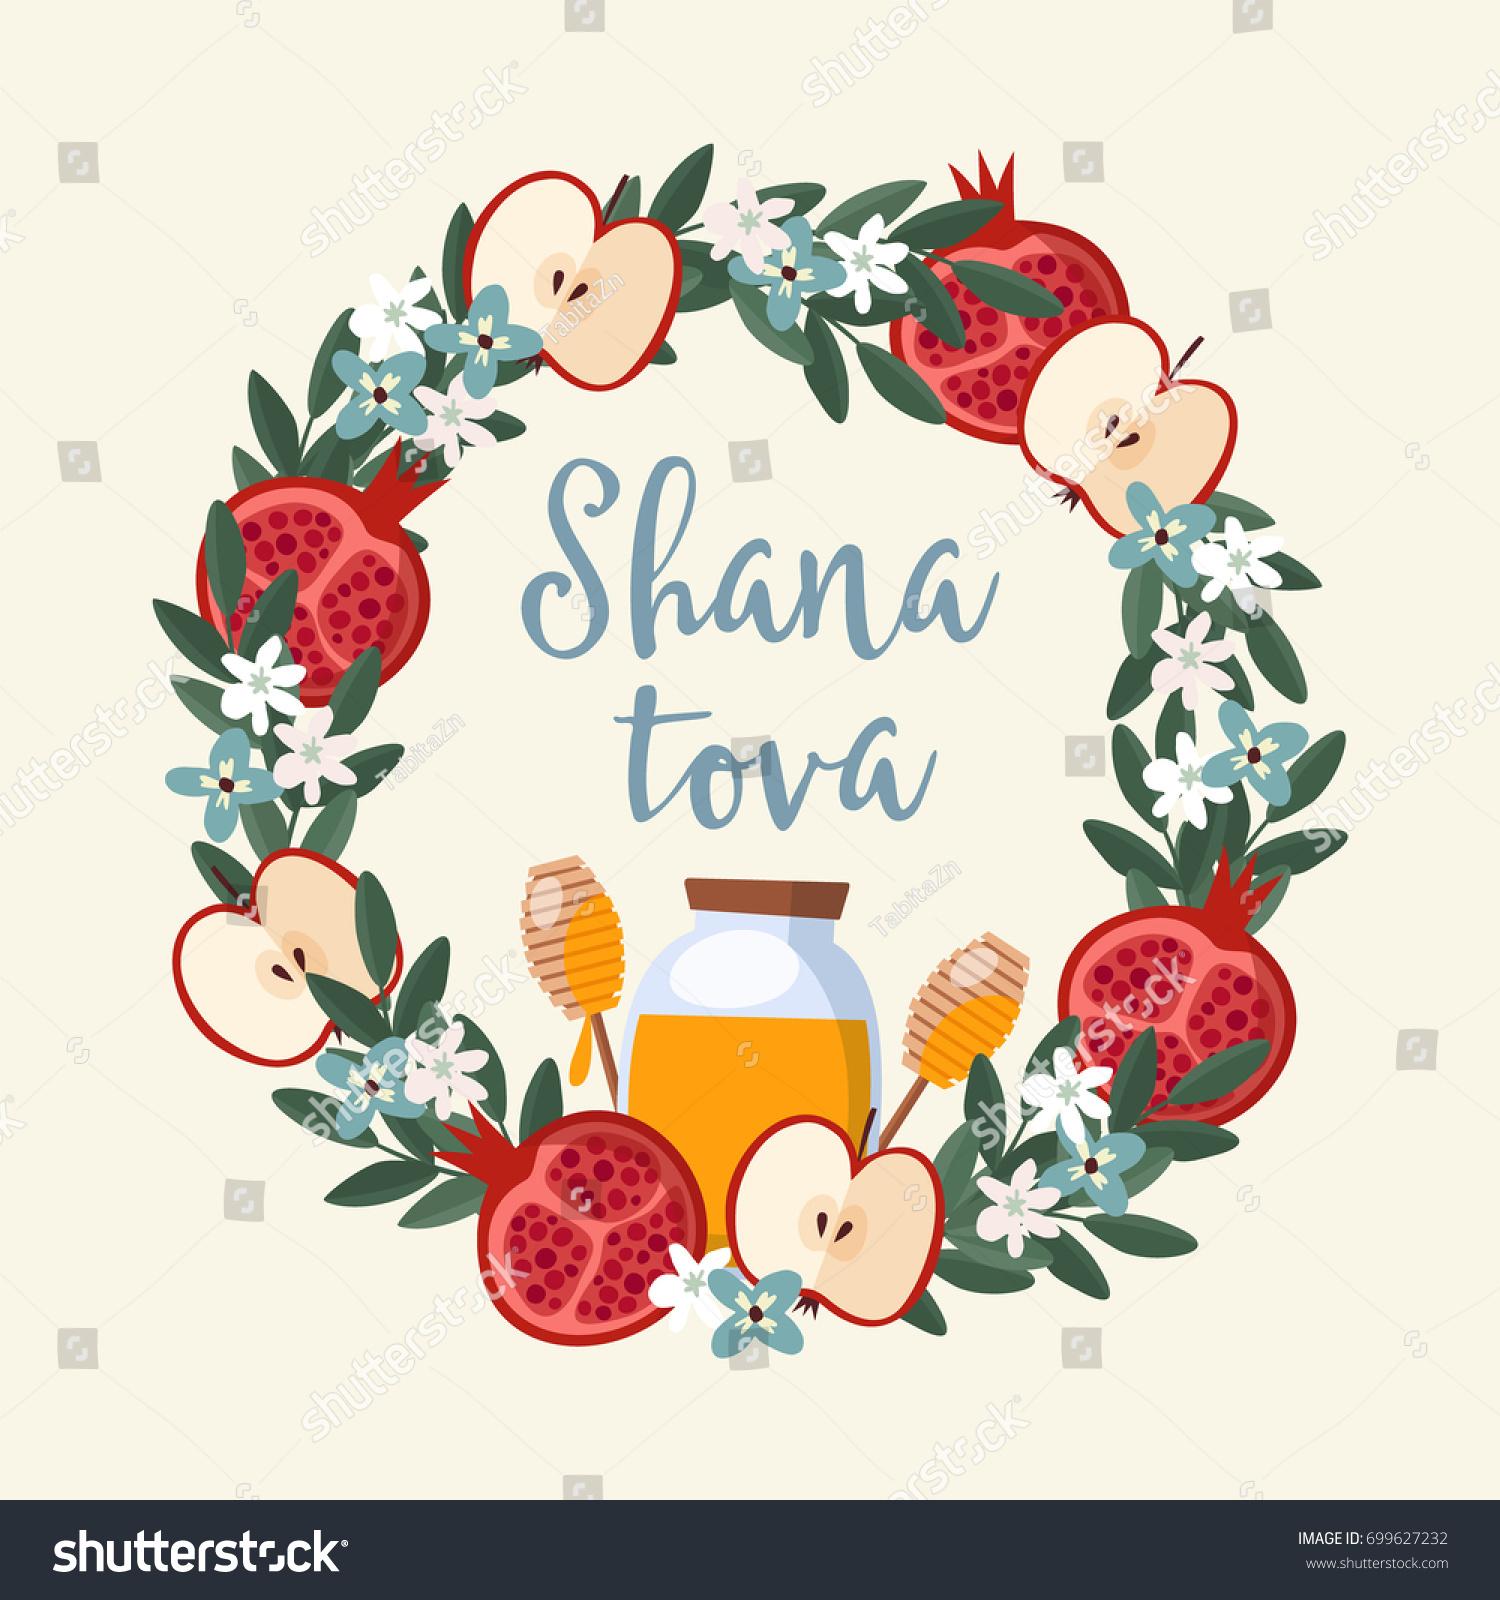 Shana tova greeting card invitation jewish stock vector 699627232 shana tova greeting card invitation for jewish new year rosh hashanah floral wreath made kristyandbryce Images